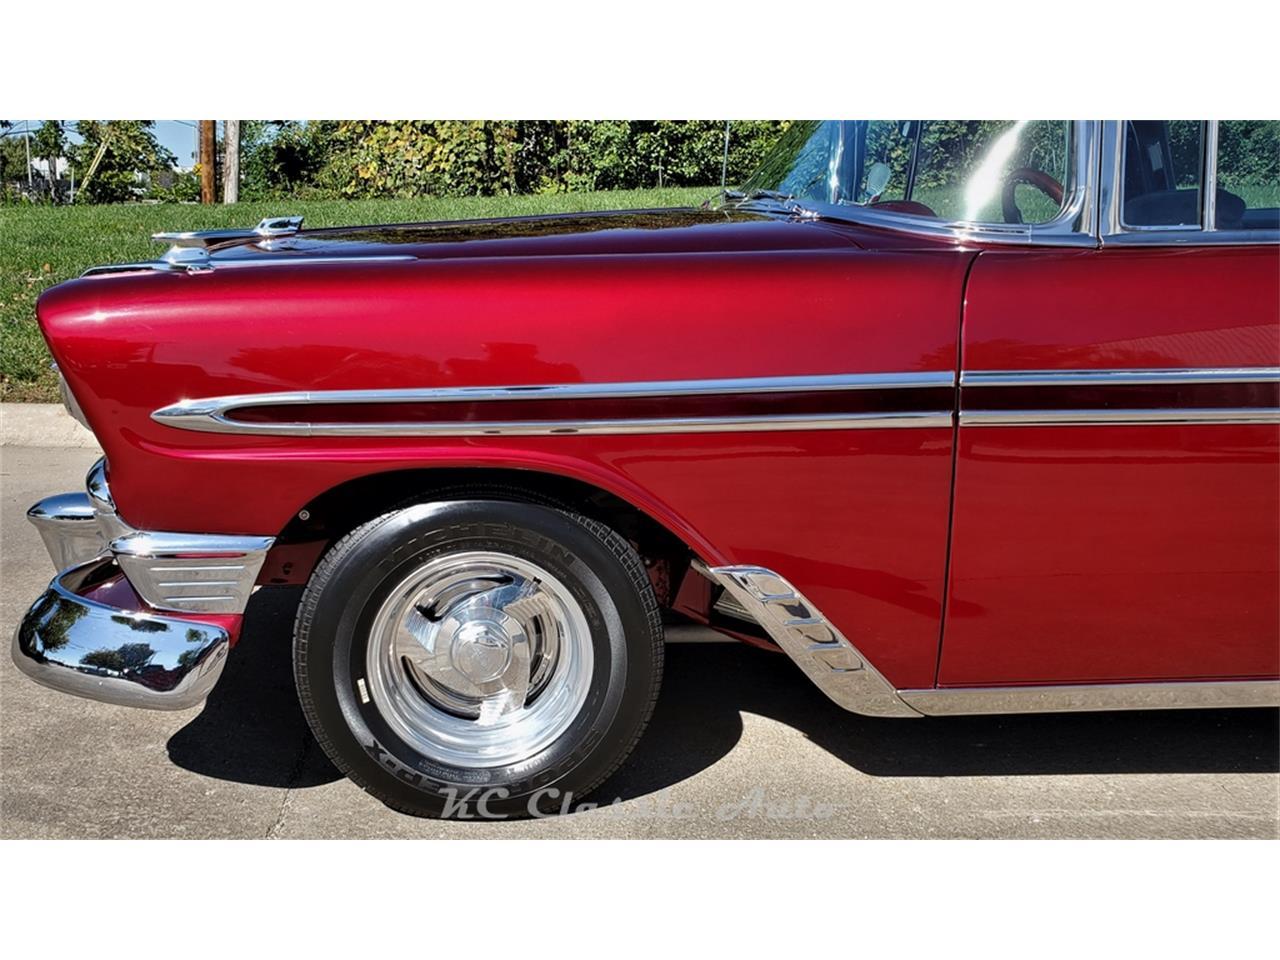 1956 Chevrolet El Camino (CC-1411015) for sale in Lenexa, Kansas